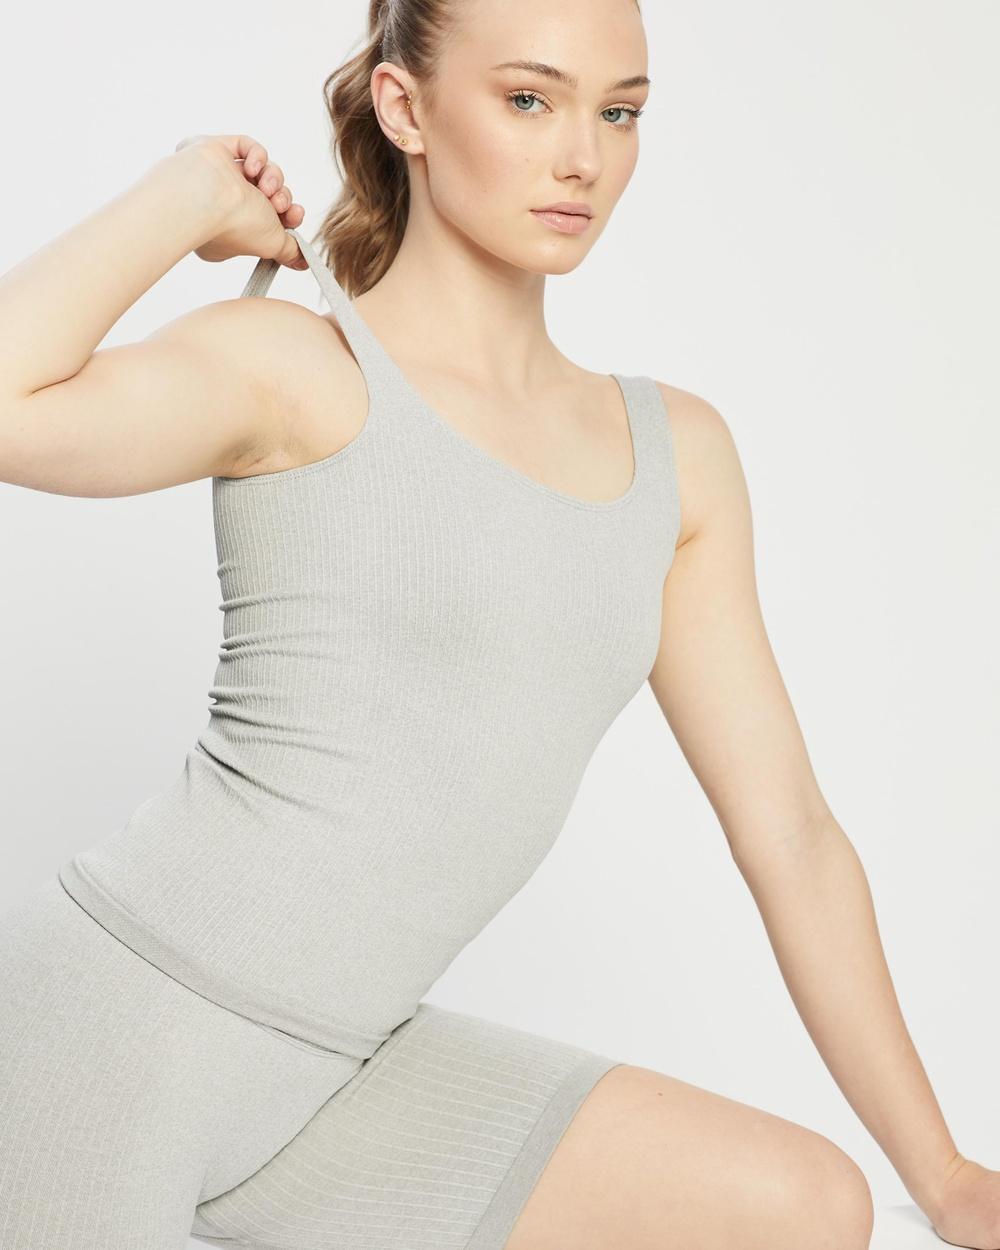 Aim'n Ribbed Seamless Singlet Muscle Tops Light Grey Melange Australia